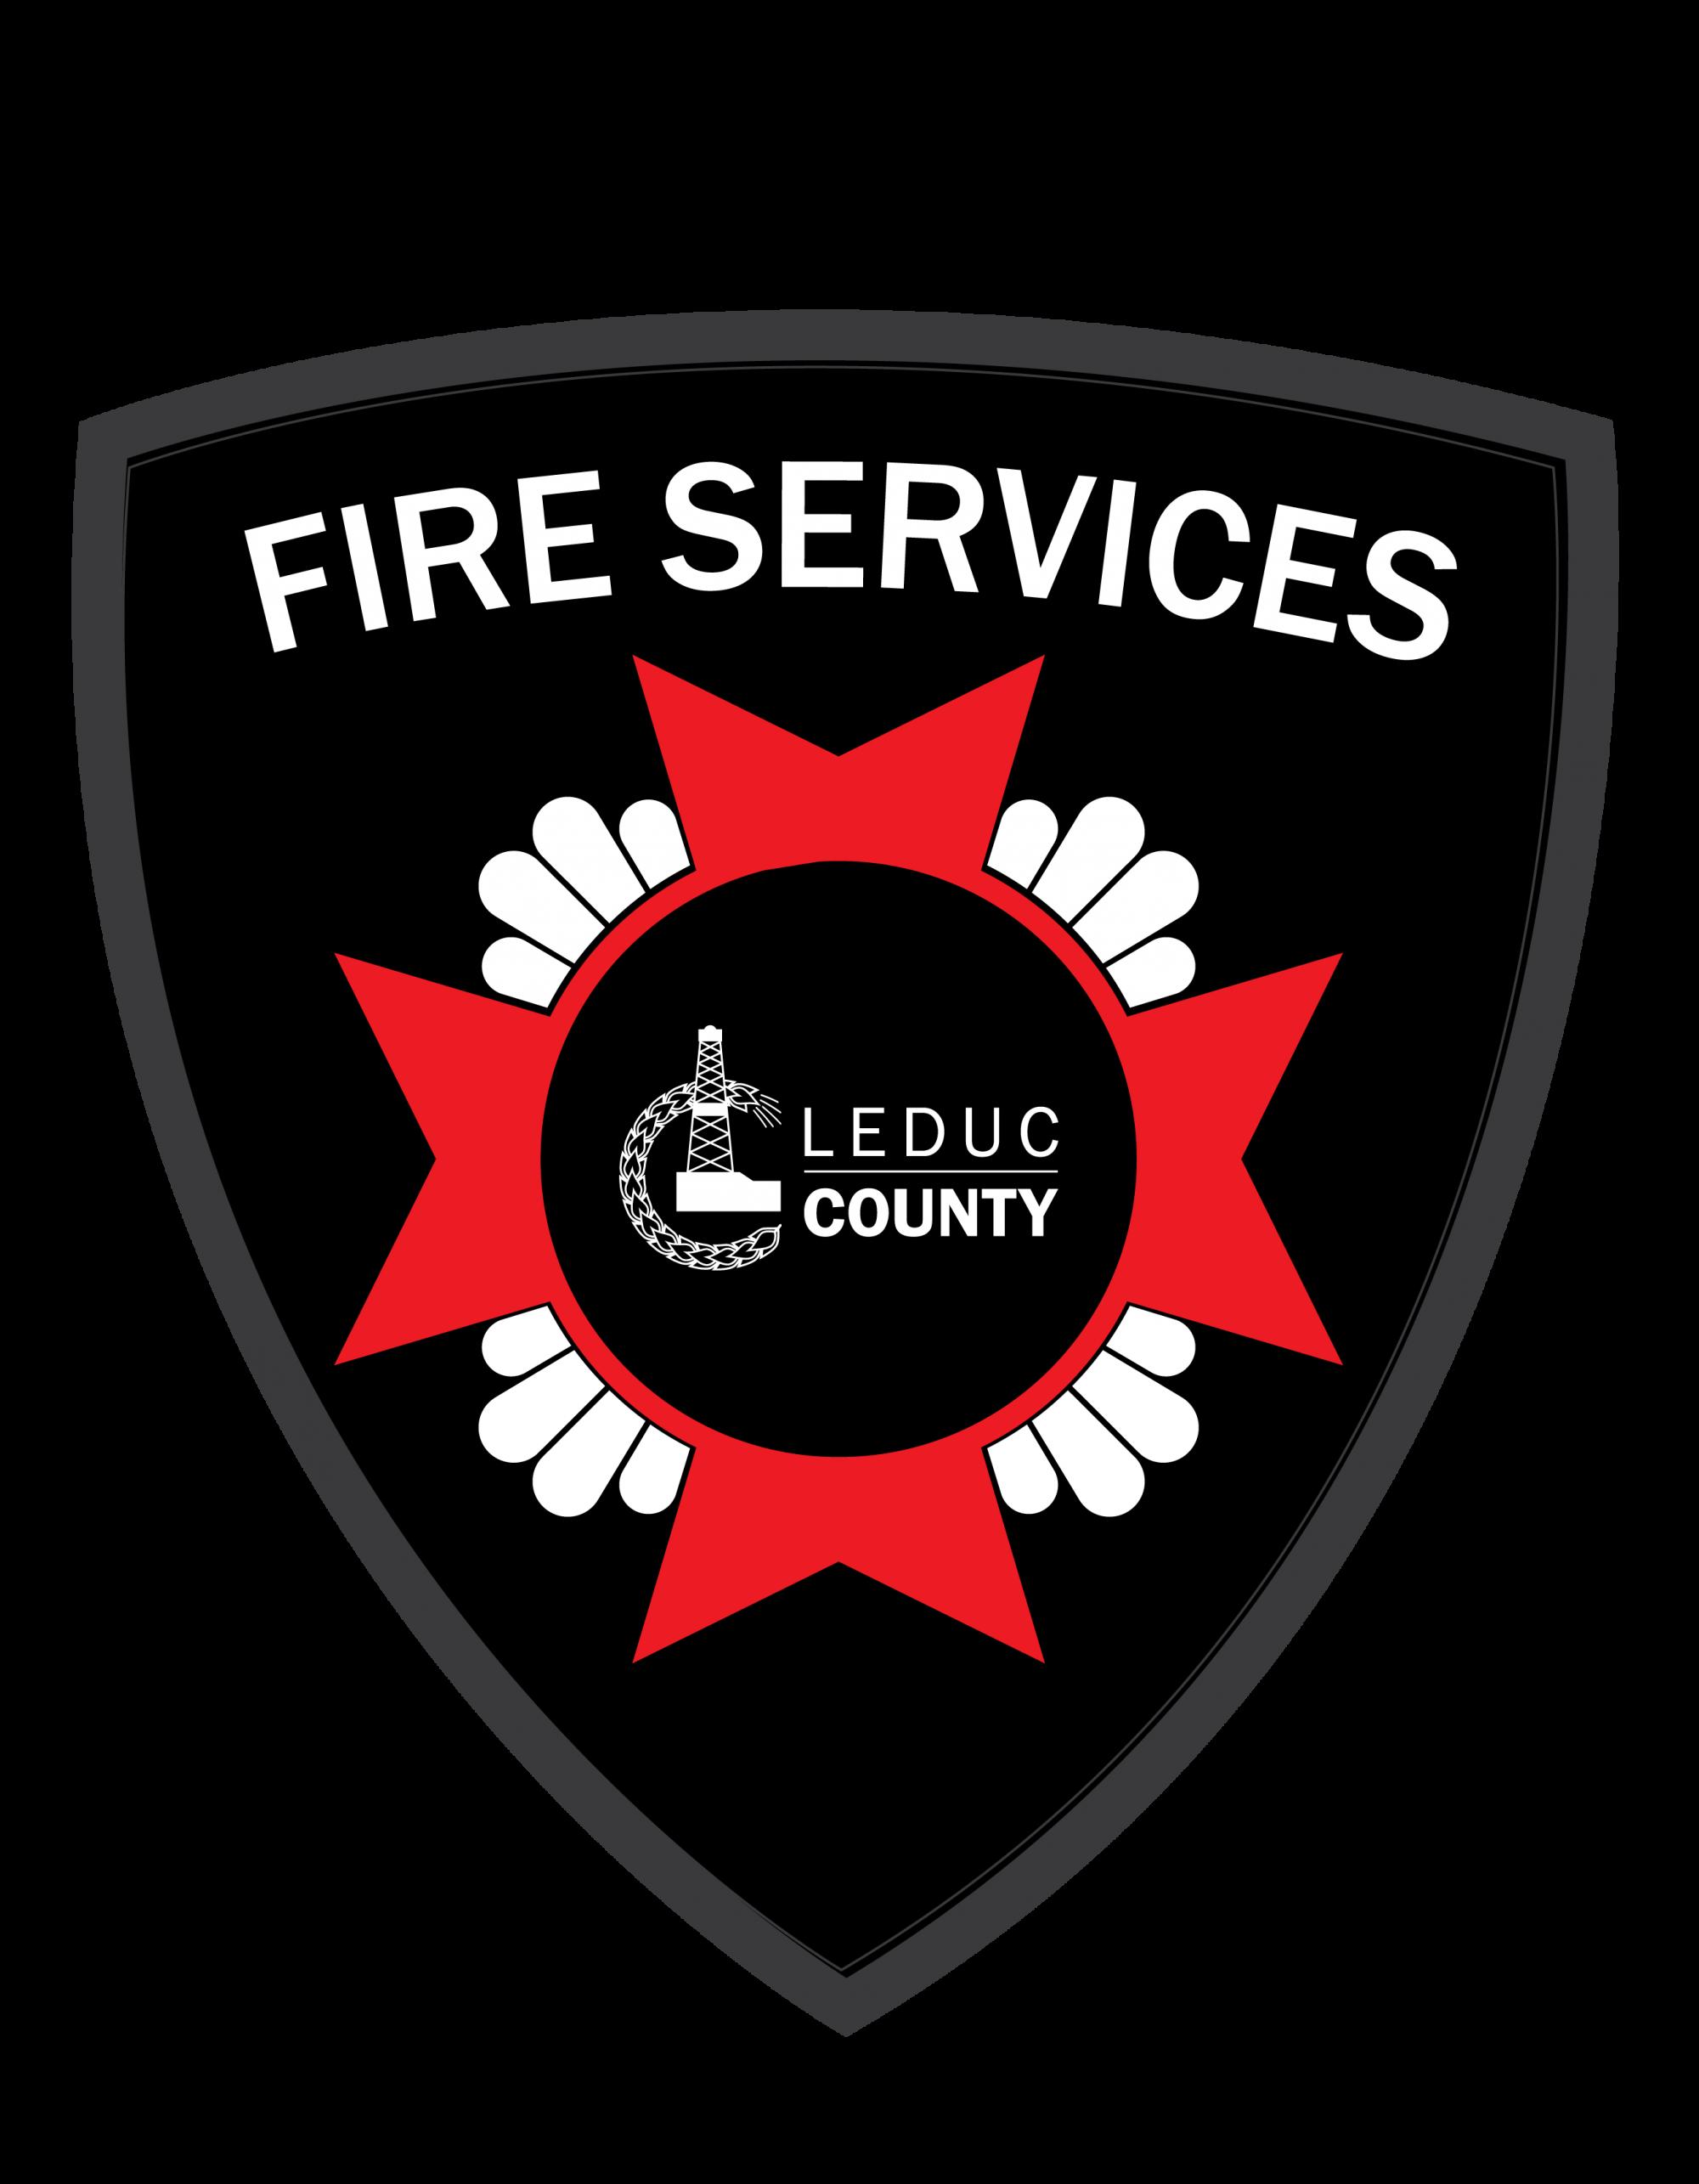 Leduc County Fire Services Logo